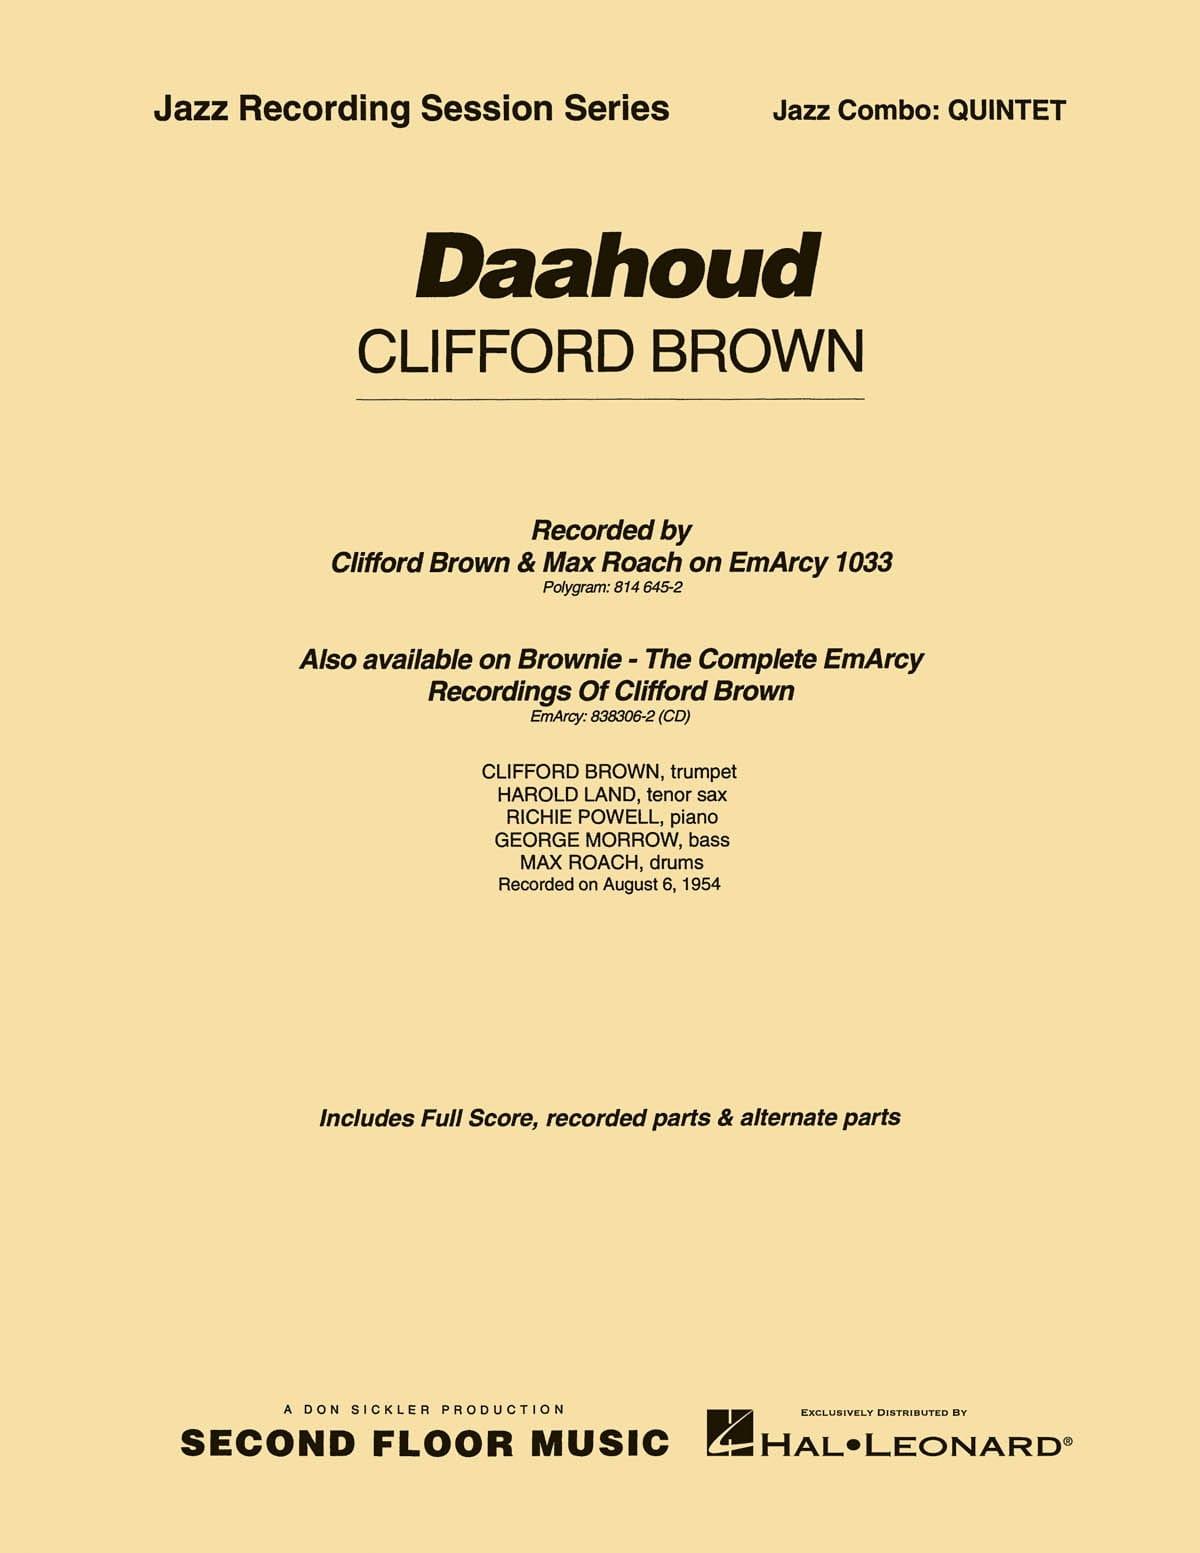 Daahoud - Clifford Brown - Partition - ENSEMBLES - laflutedepan.com